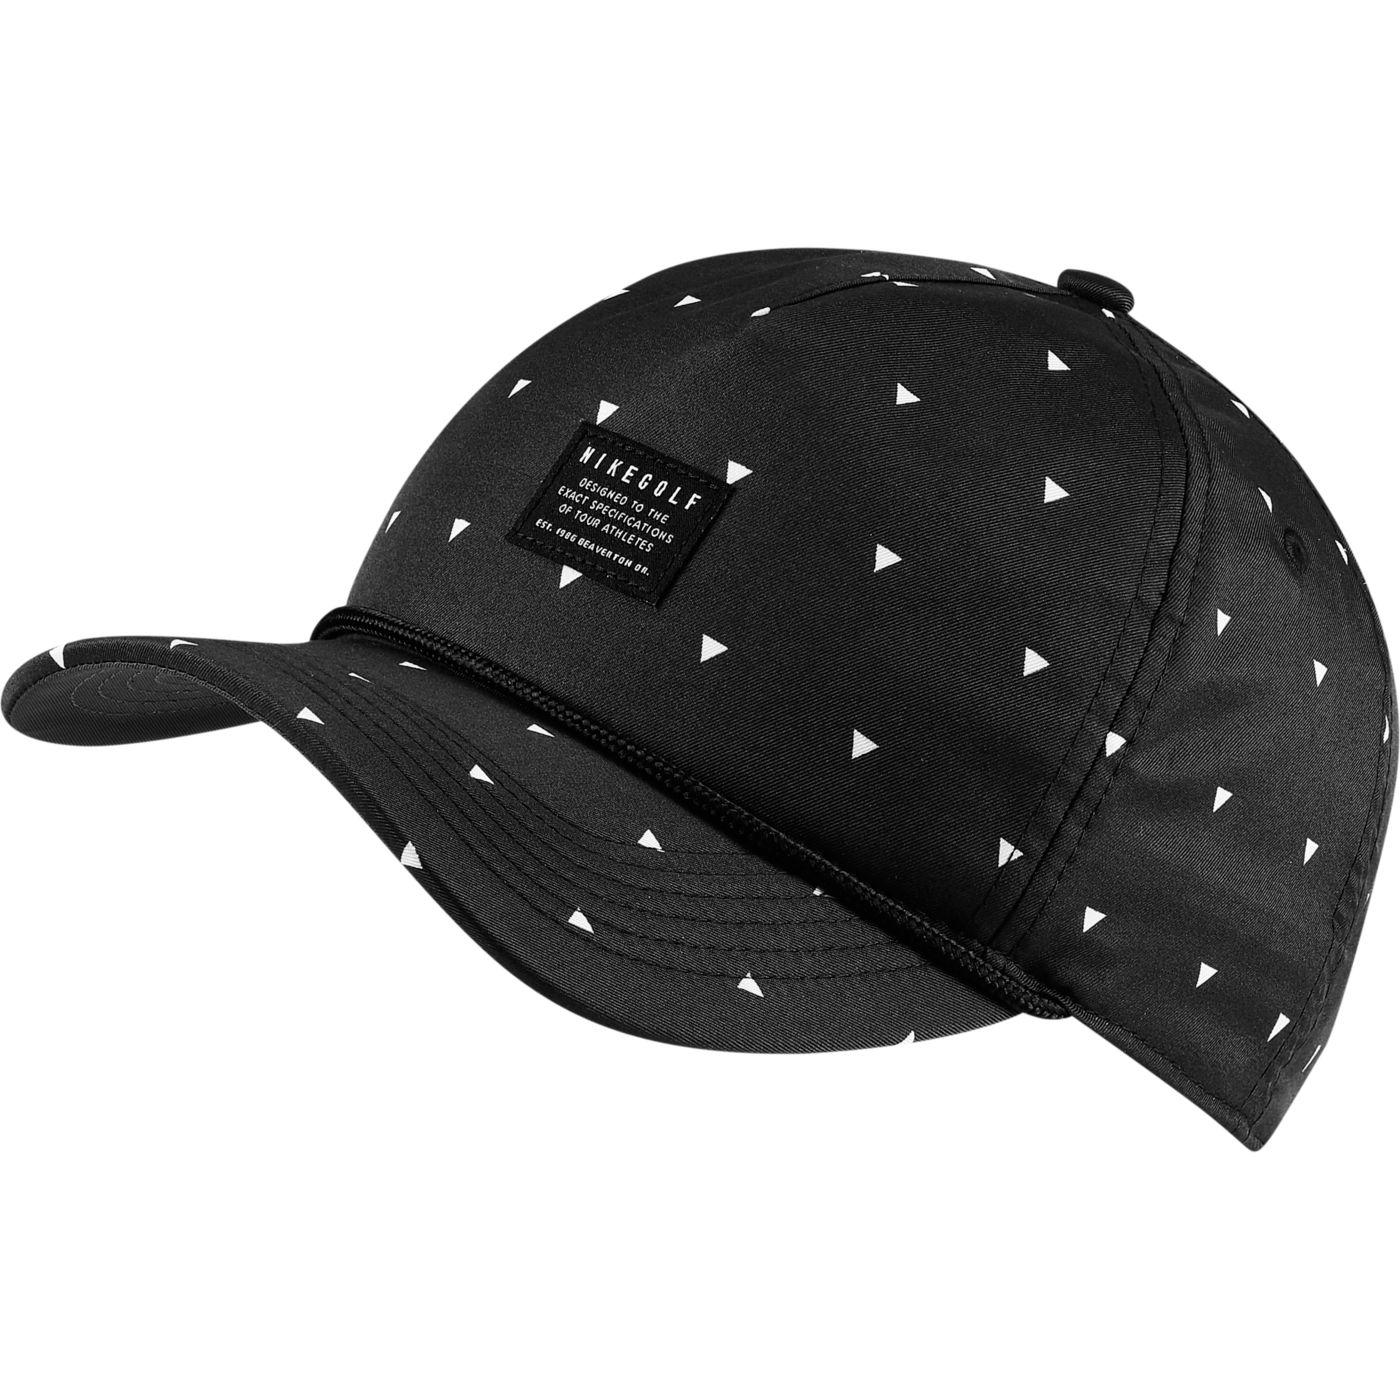 Nike Men's AeroBill Classic99 Golf Hat